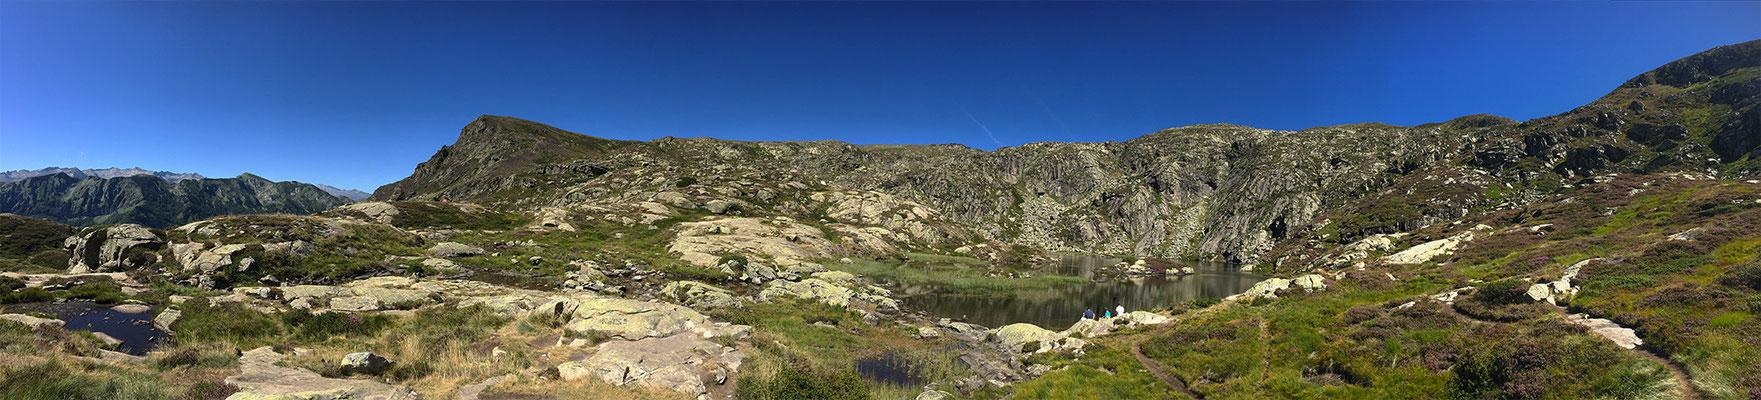 Pano montagne lac